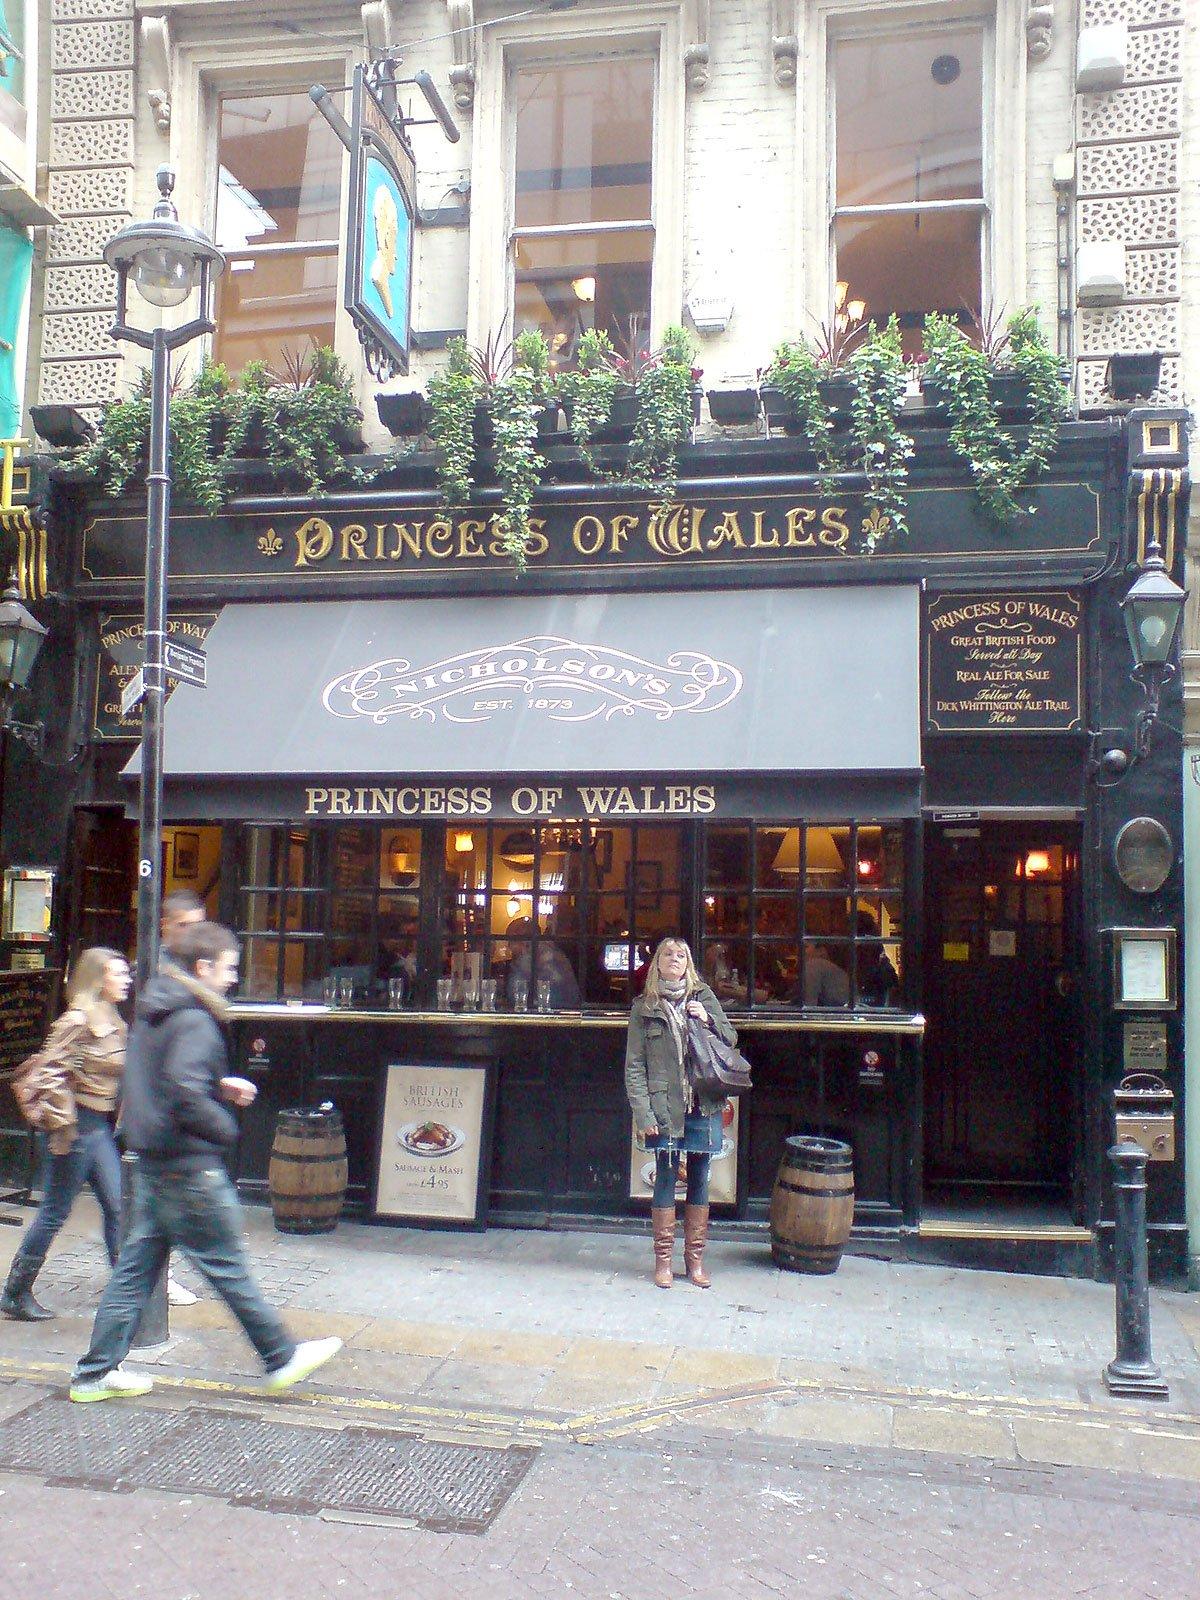 Princess of Wales Charing Cross London Pub Review - Princess of Wales, Charing Cross, London - Pub Review